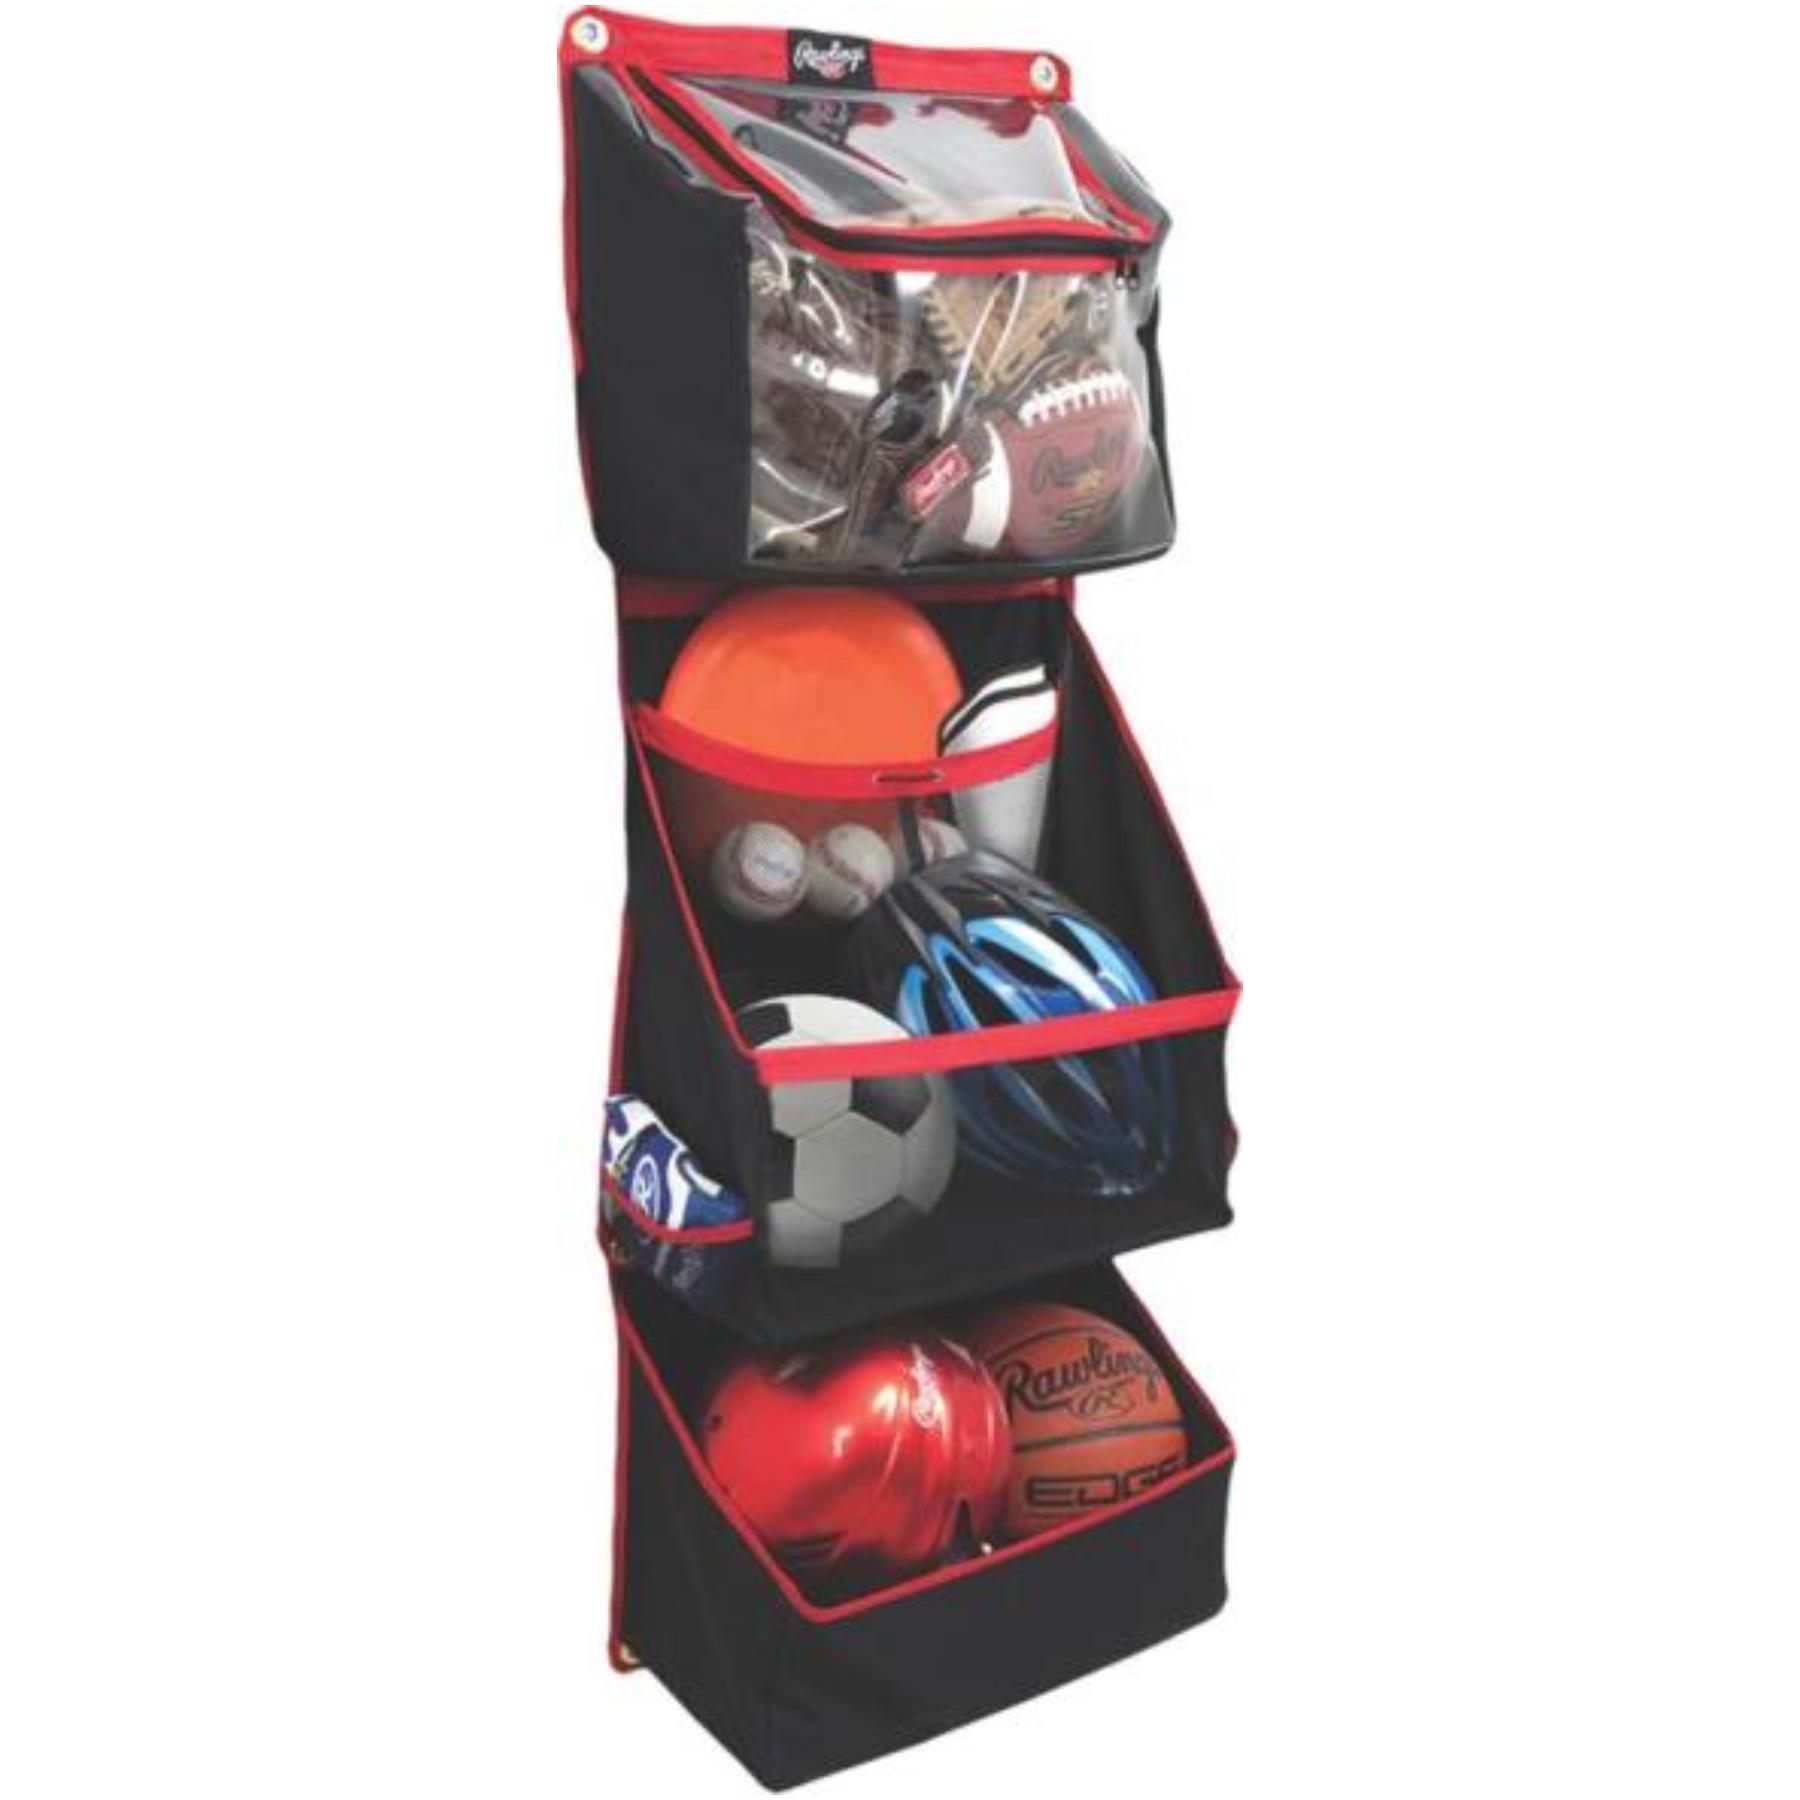 Crawford FSSBH16 Horizontal Sport Storage Organizer, 8-1/2 in L x 18 in W x 48 in D, Black/Red